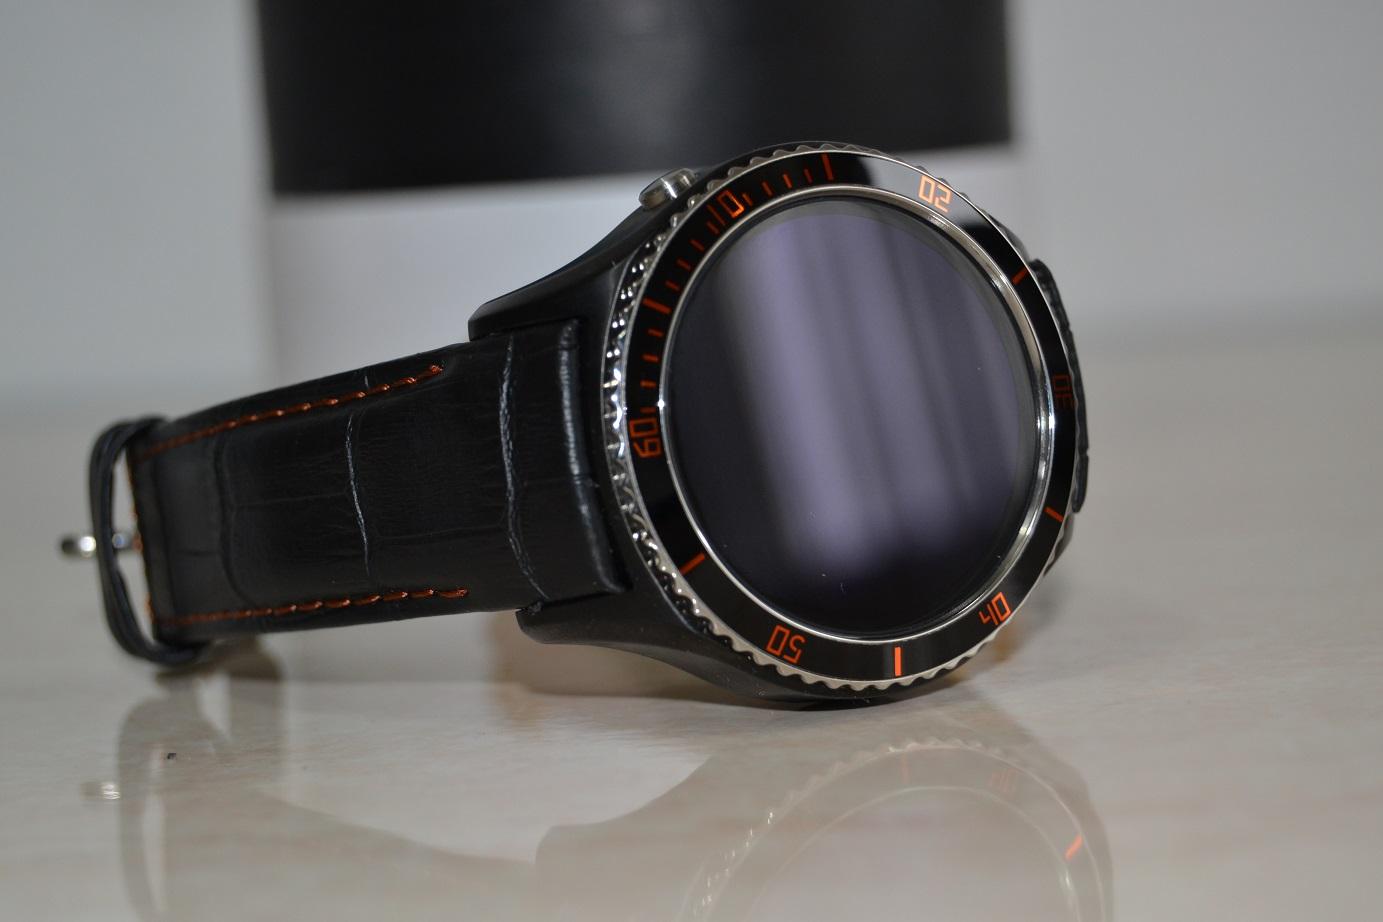 dsc_0808 Unboxing si primele pareri, IQI I2 smartwatch cu Android, 3G si WiFi